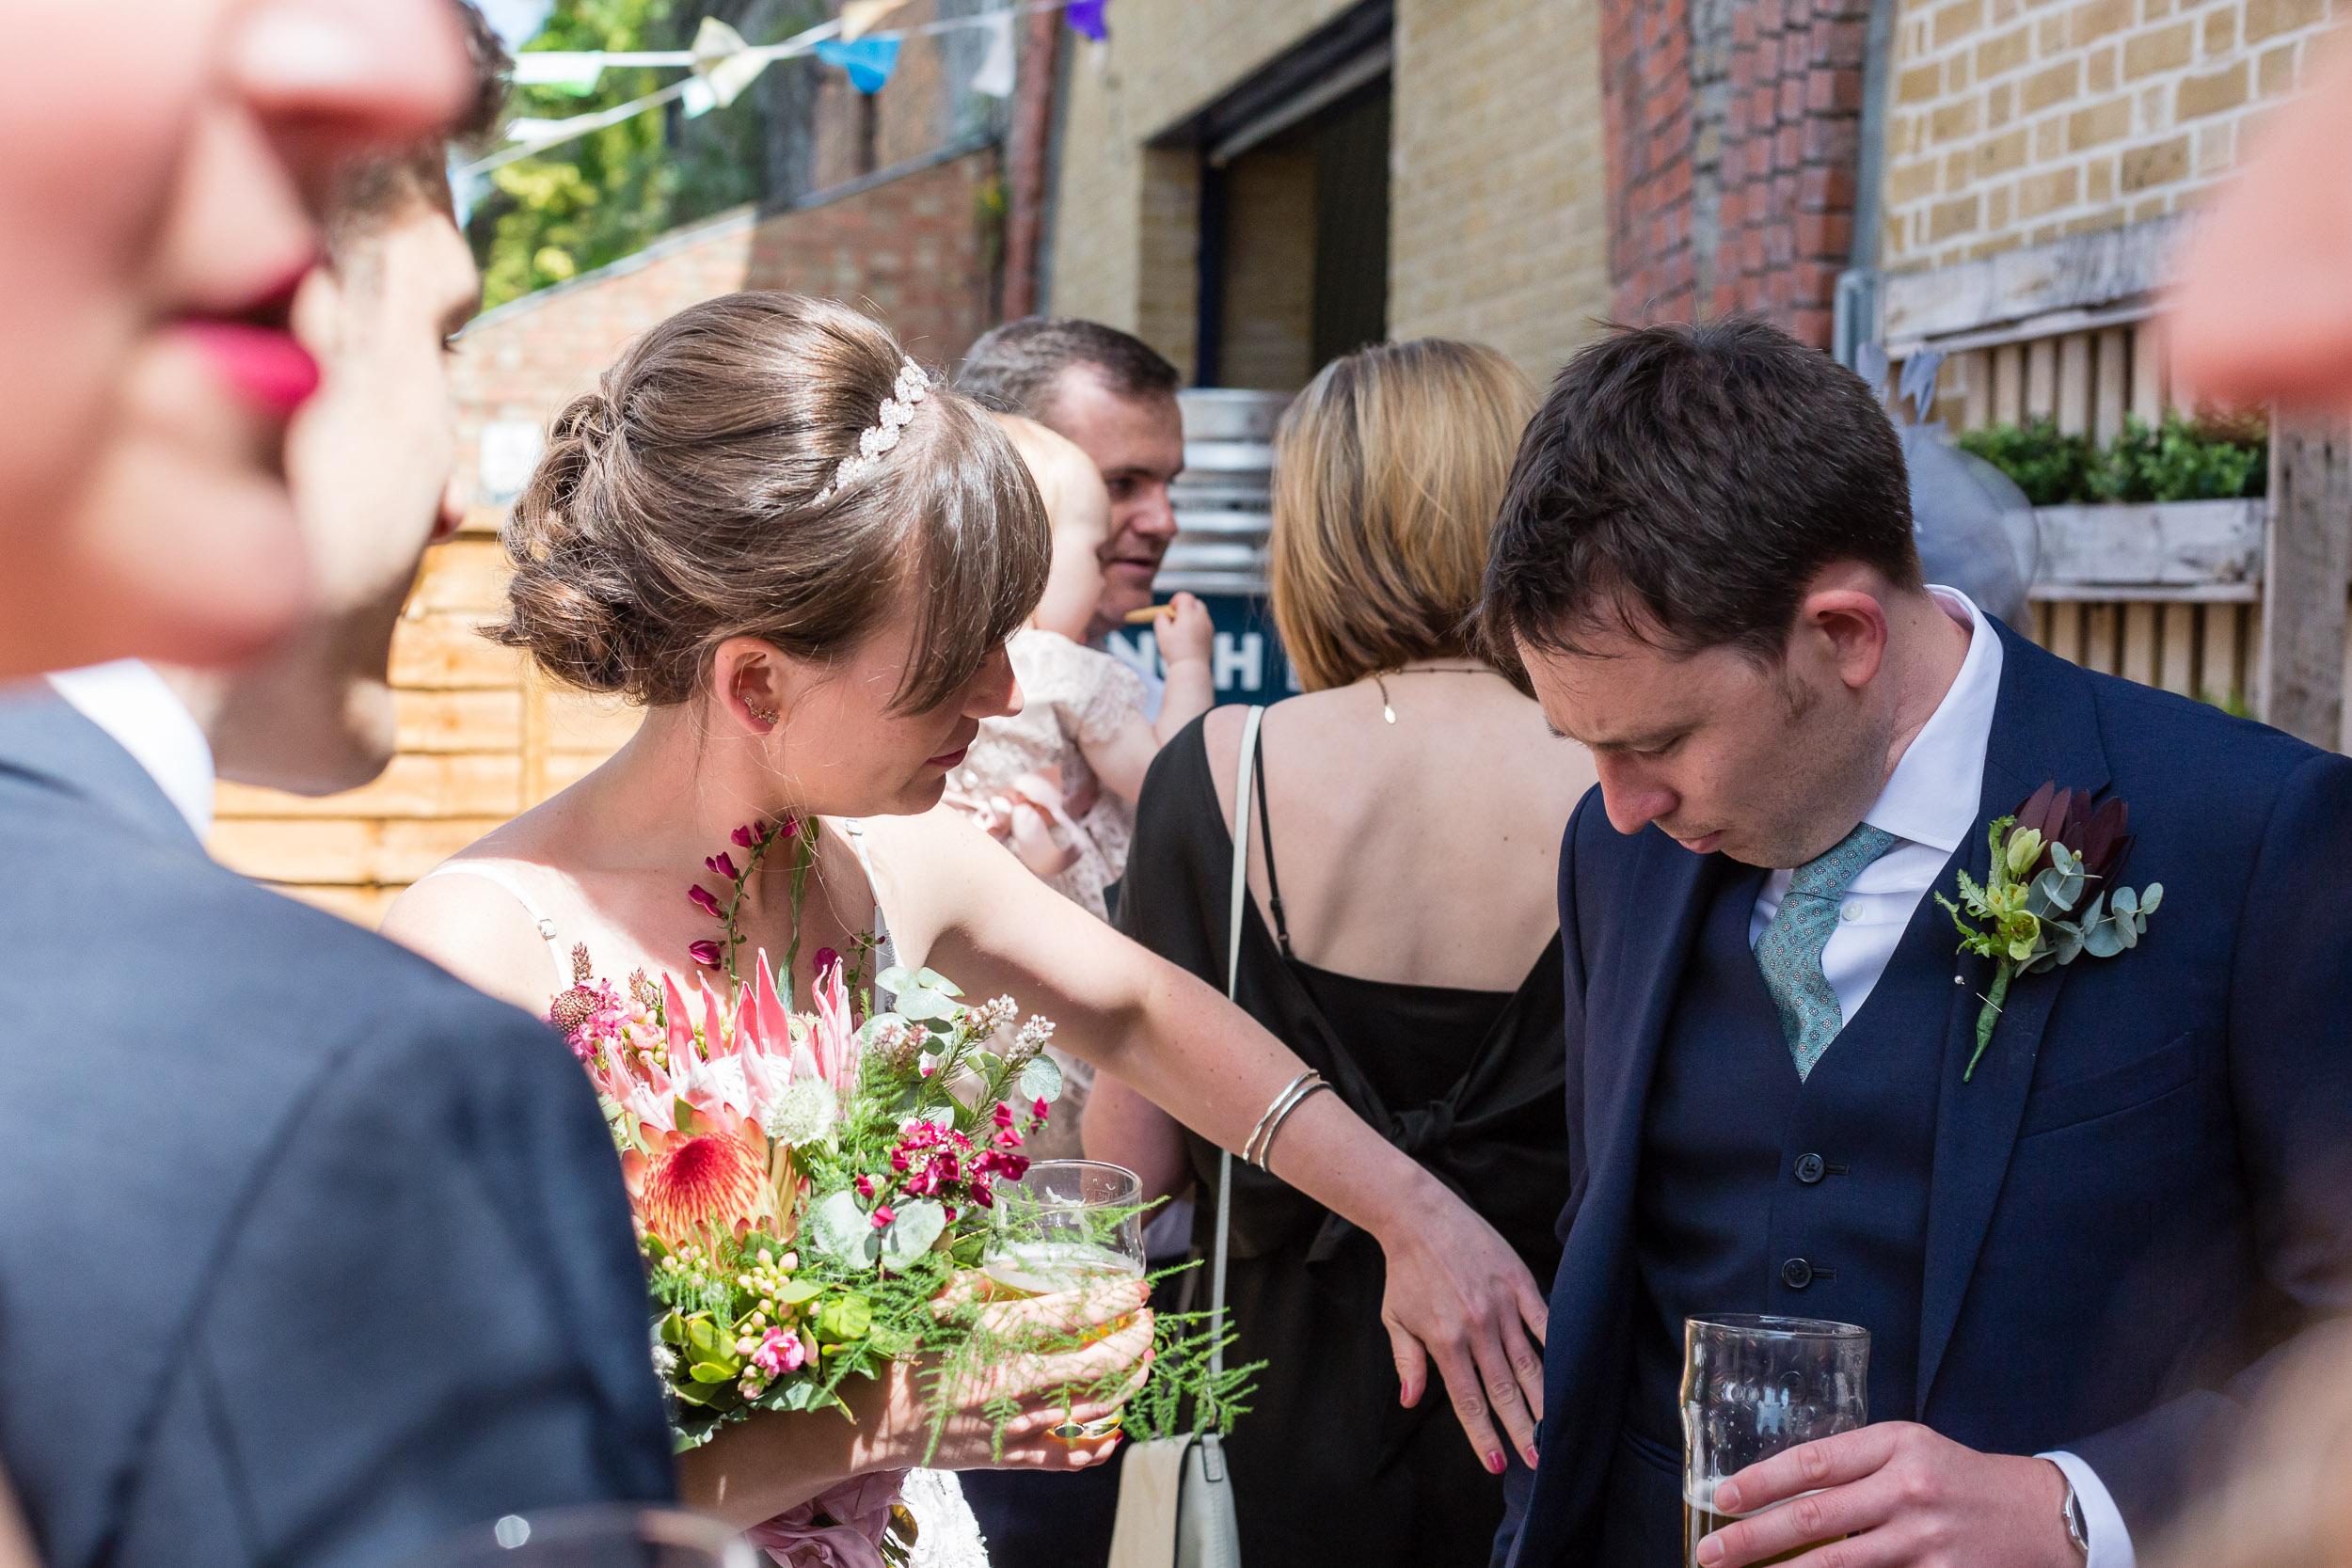 brockwell-lido-brixton-herne-hill-wedding-064.jpg